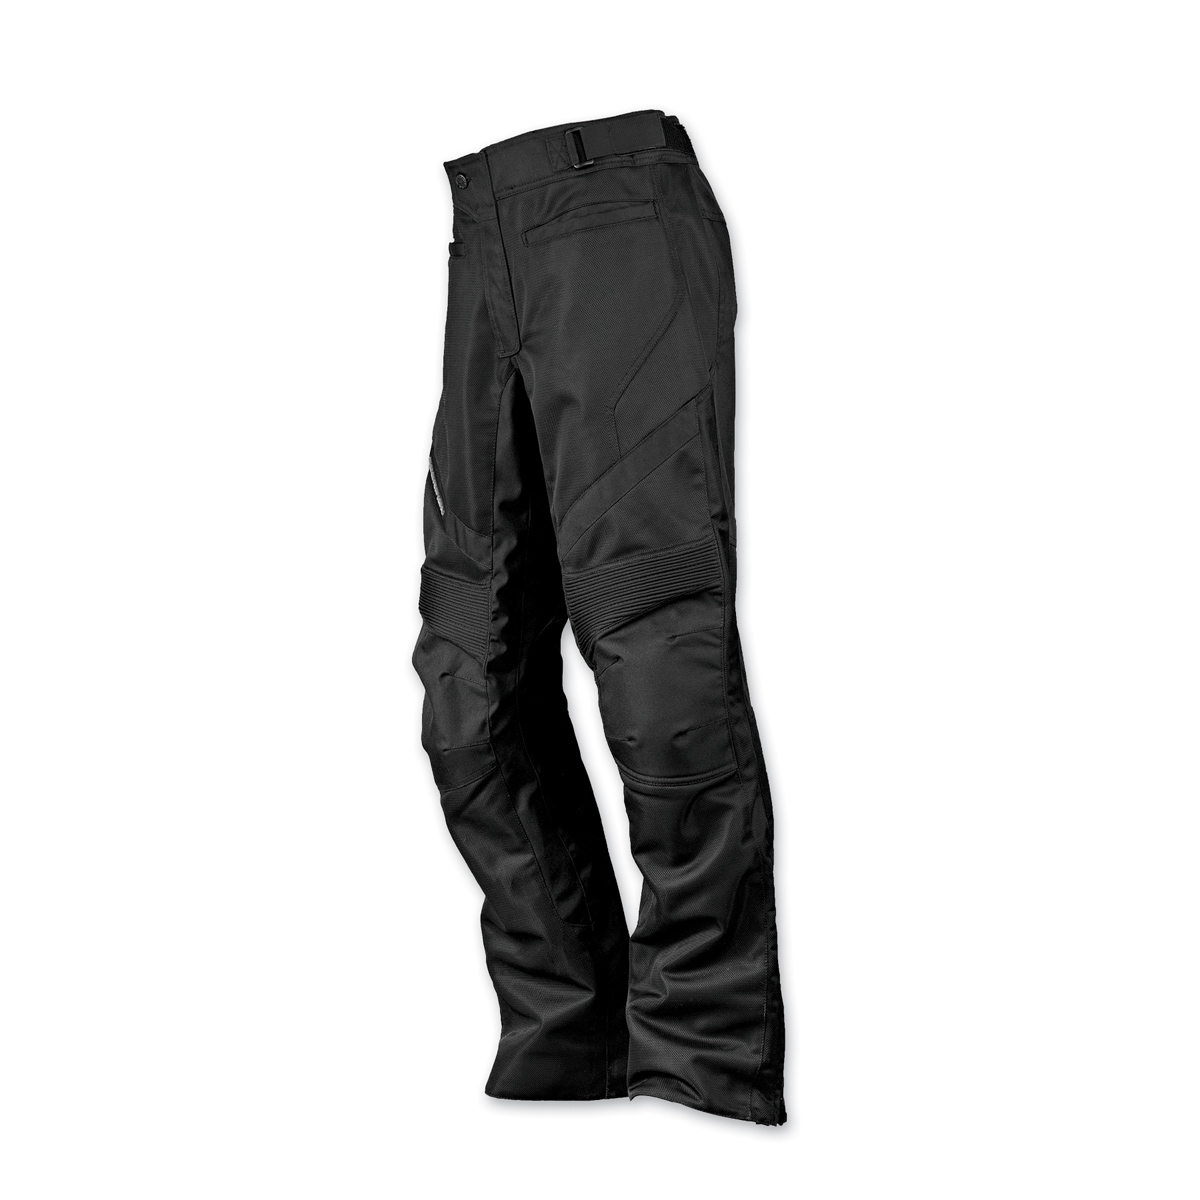 Scorpion EXO Men's Drafter II Black Mesh Pants